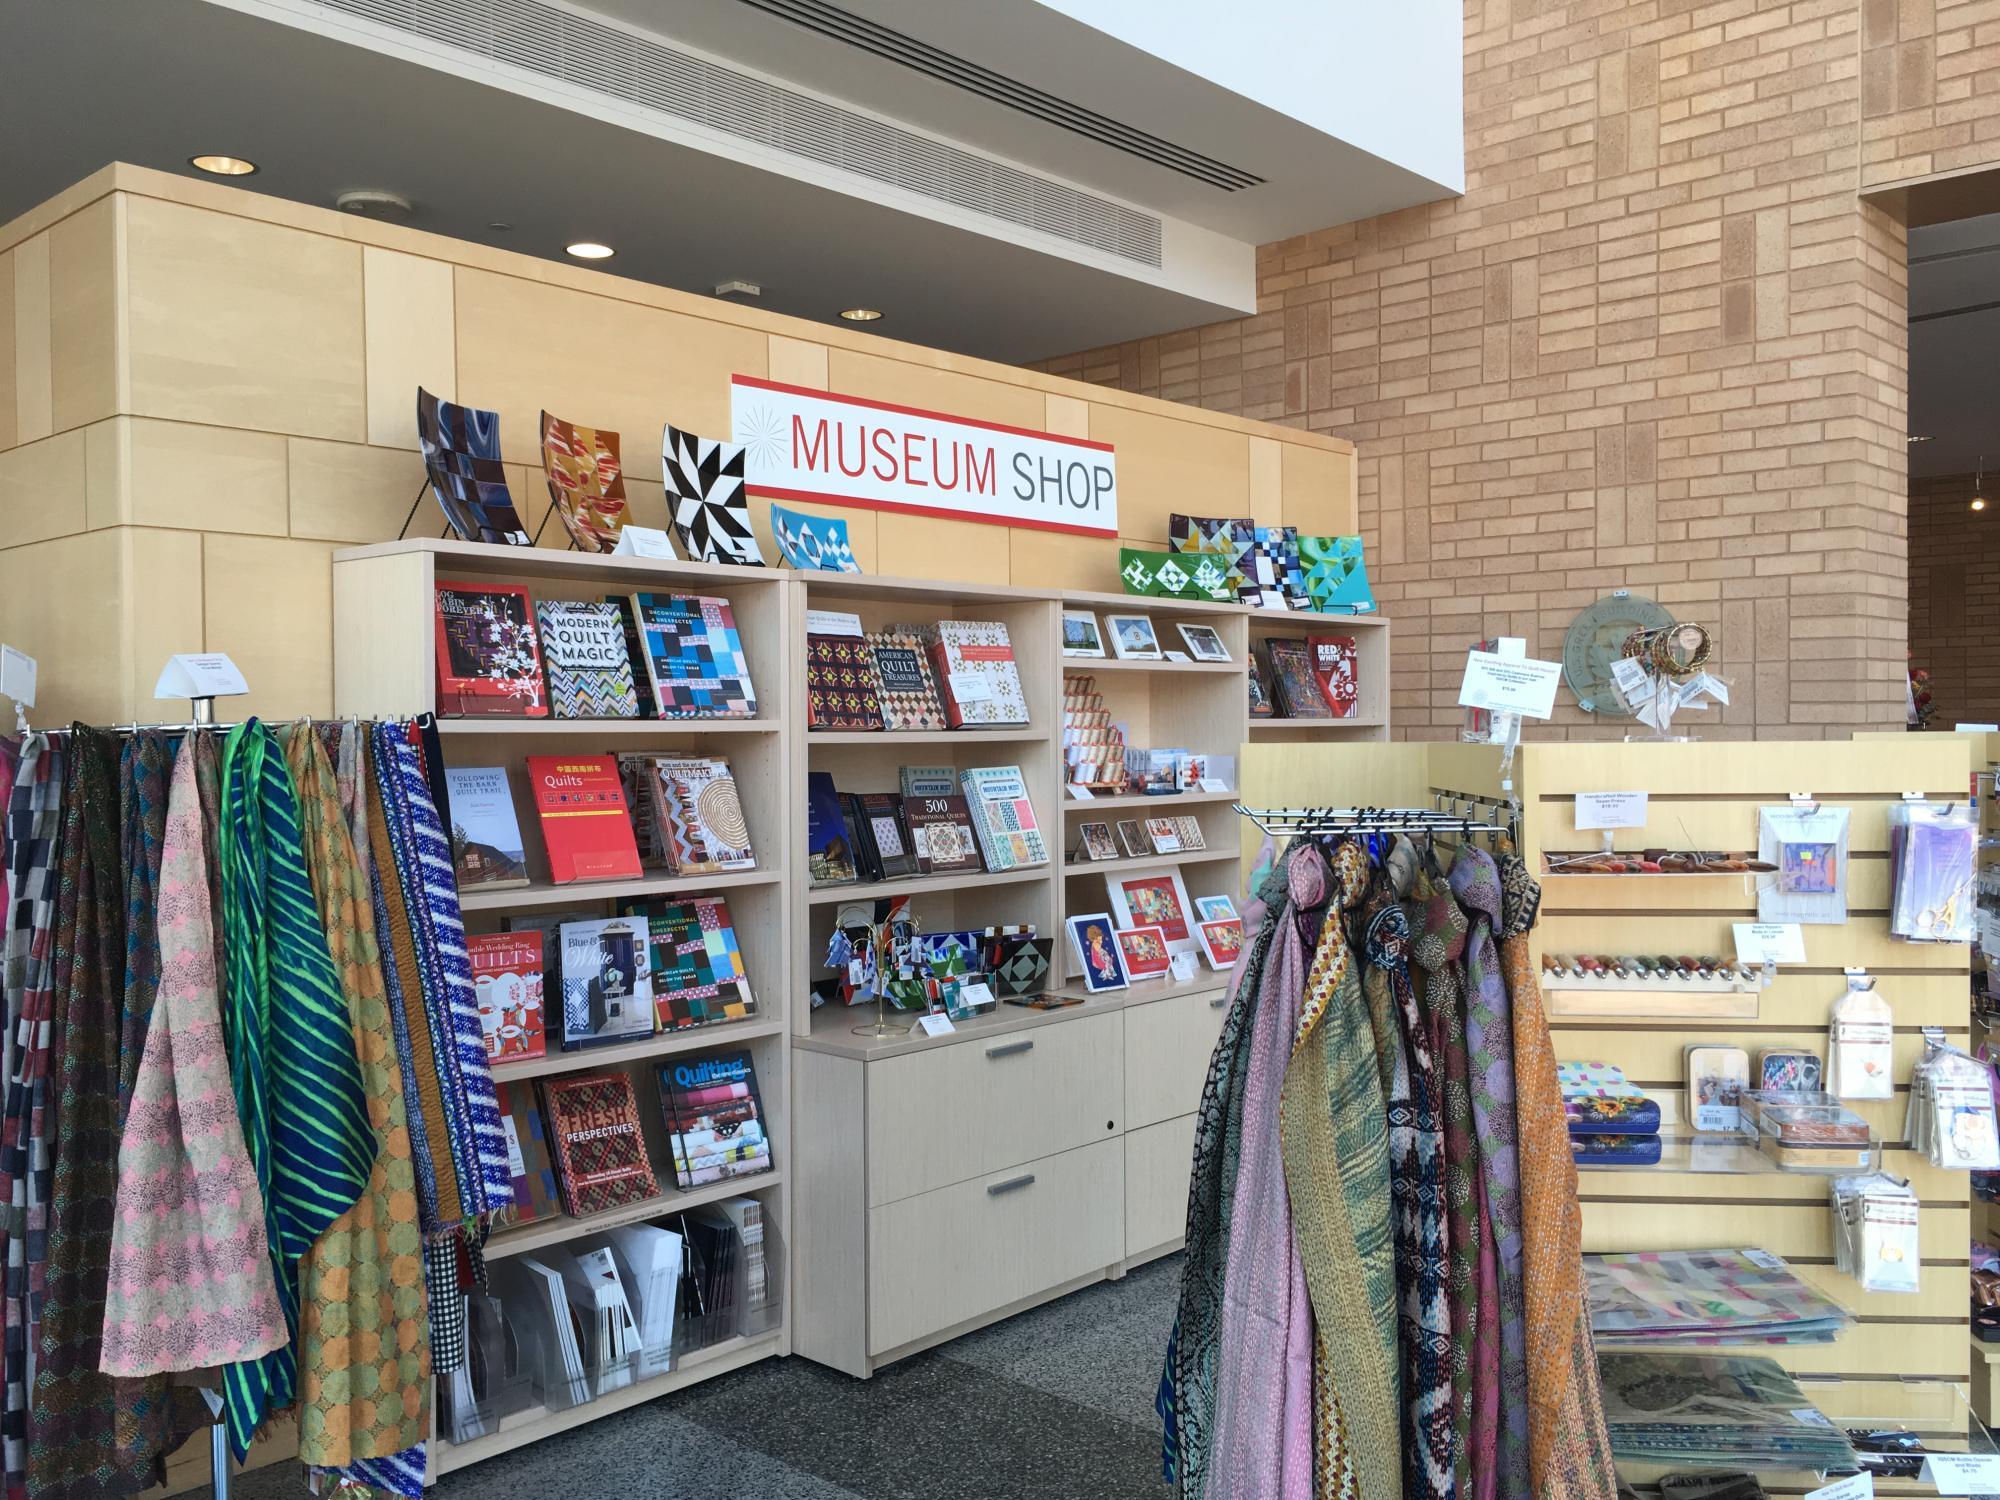 Museum Shop Promo Image